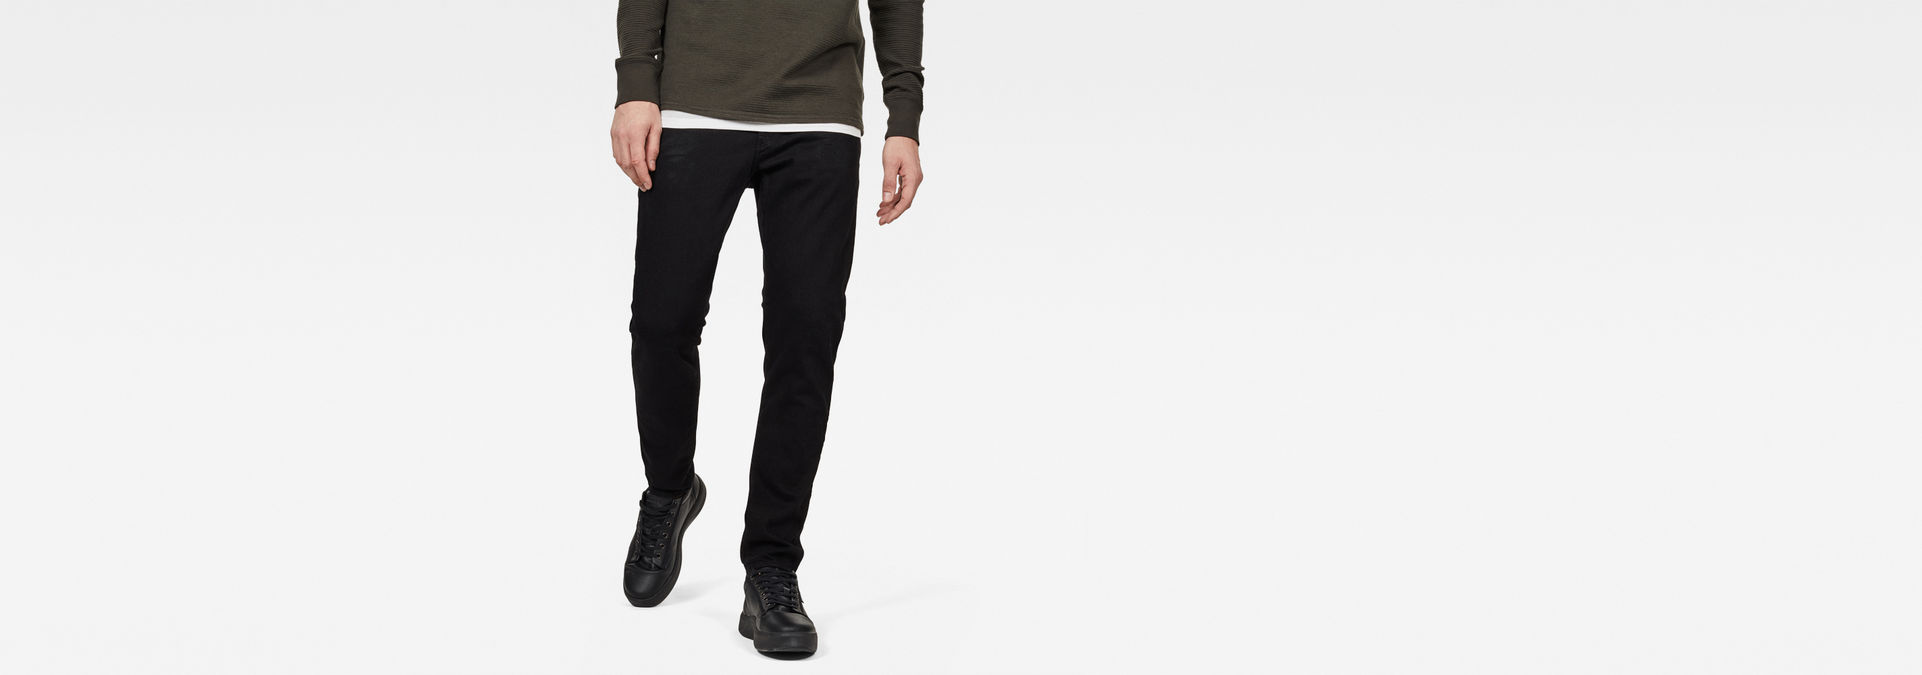 MEGA STYLE NEUF G-STAR 3301 Slim Stretch Jeans//Pantalon Tailles: 33//32